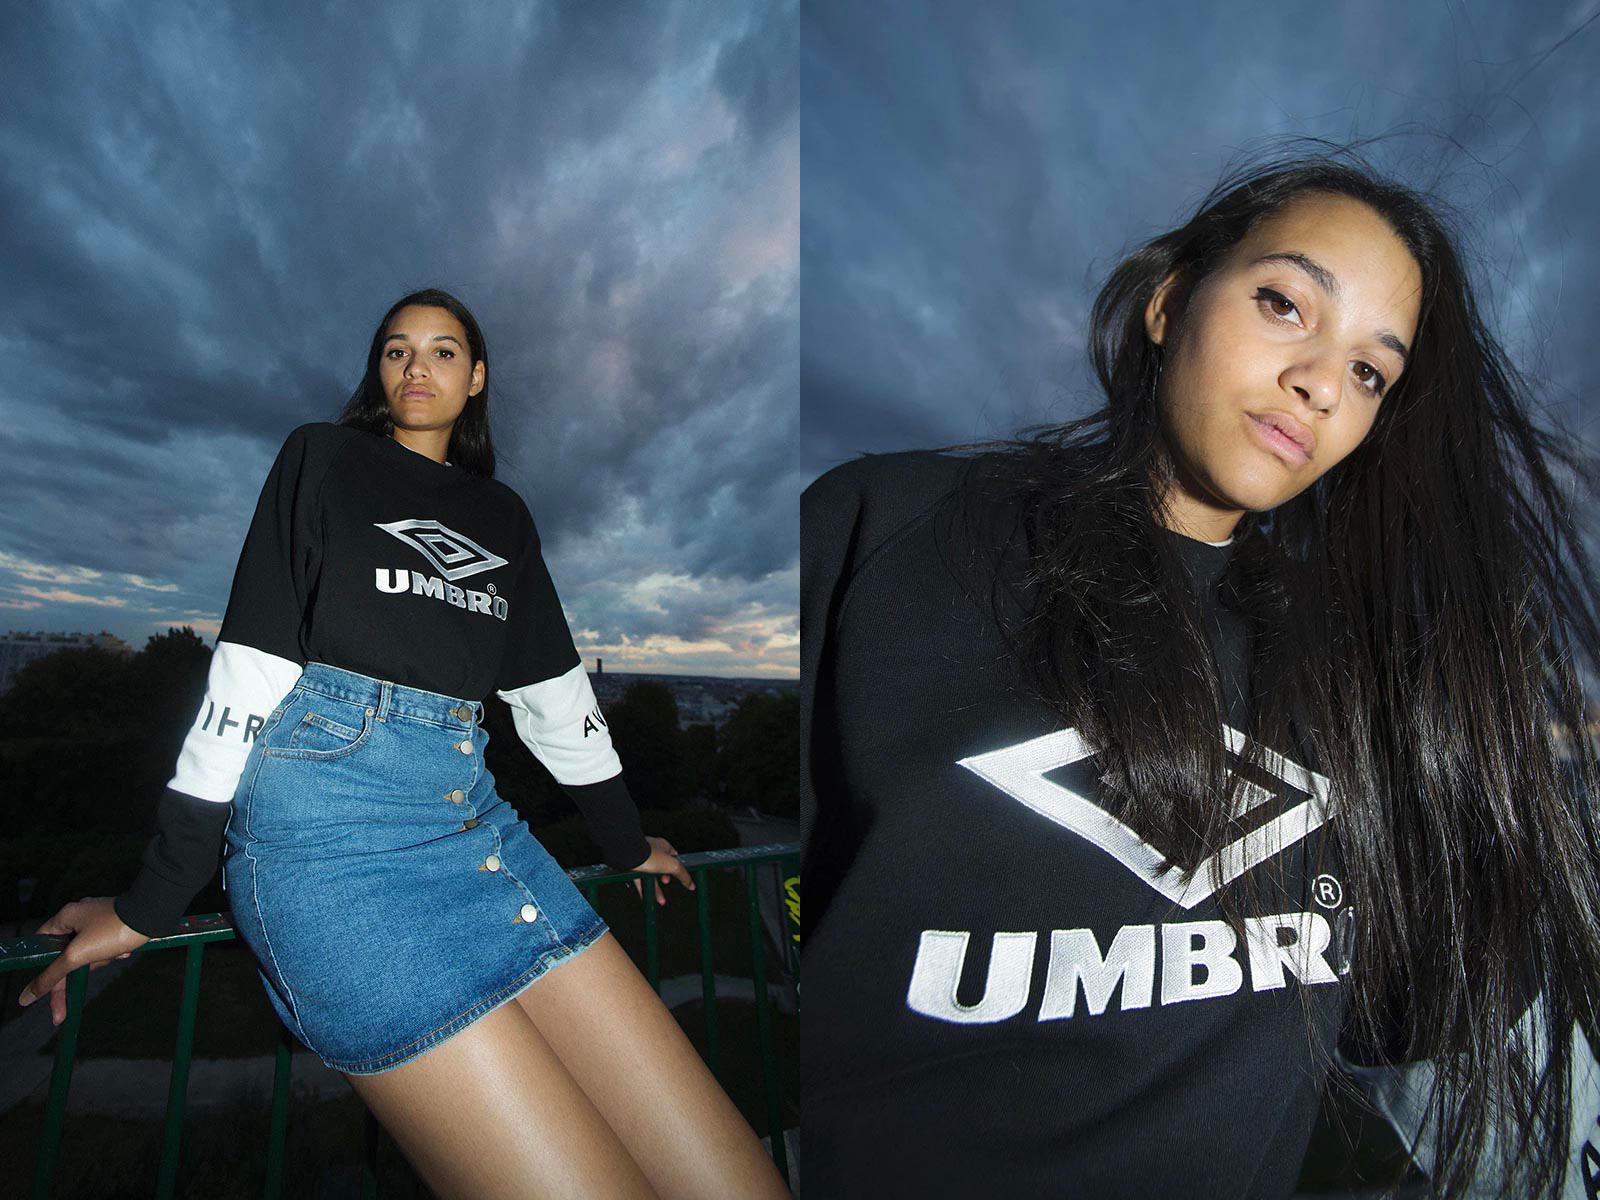 umbro-x-avnier-capsule-collection_0001_layer-15